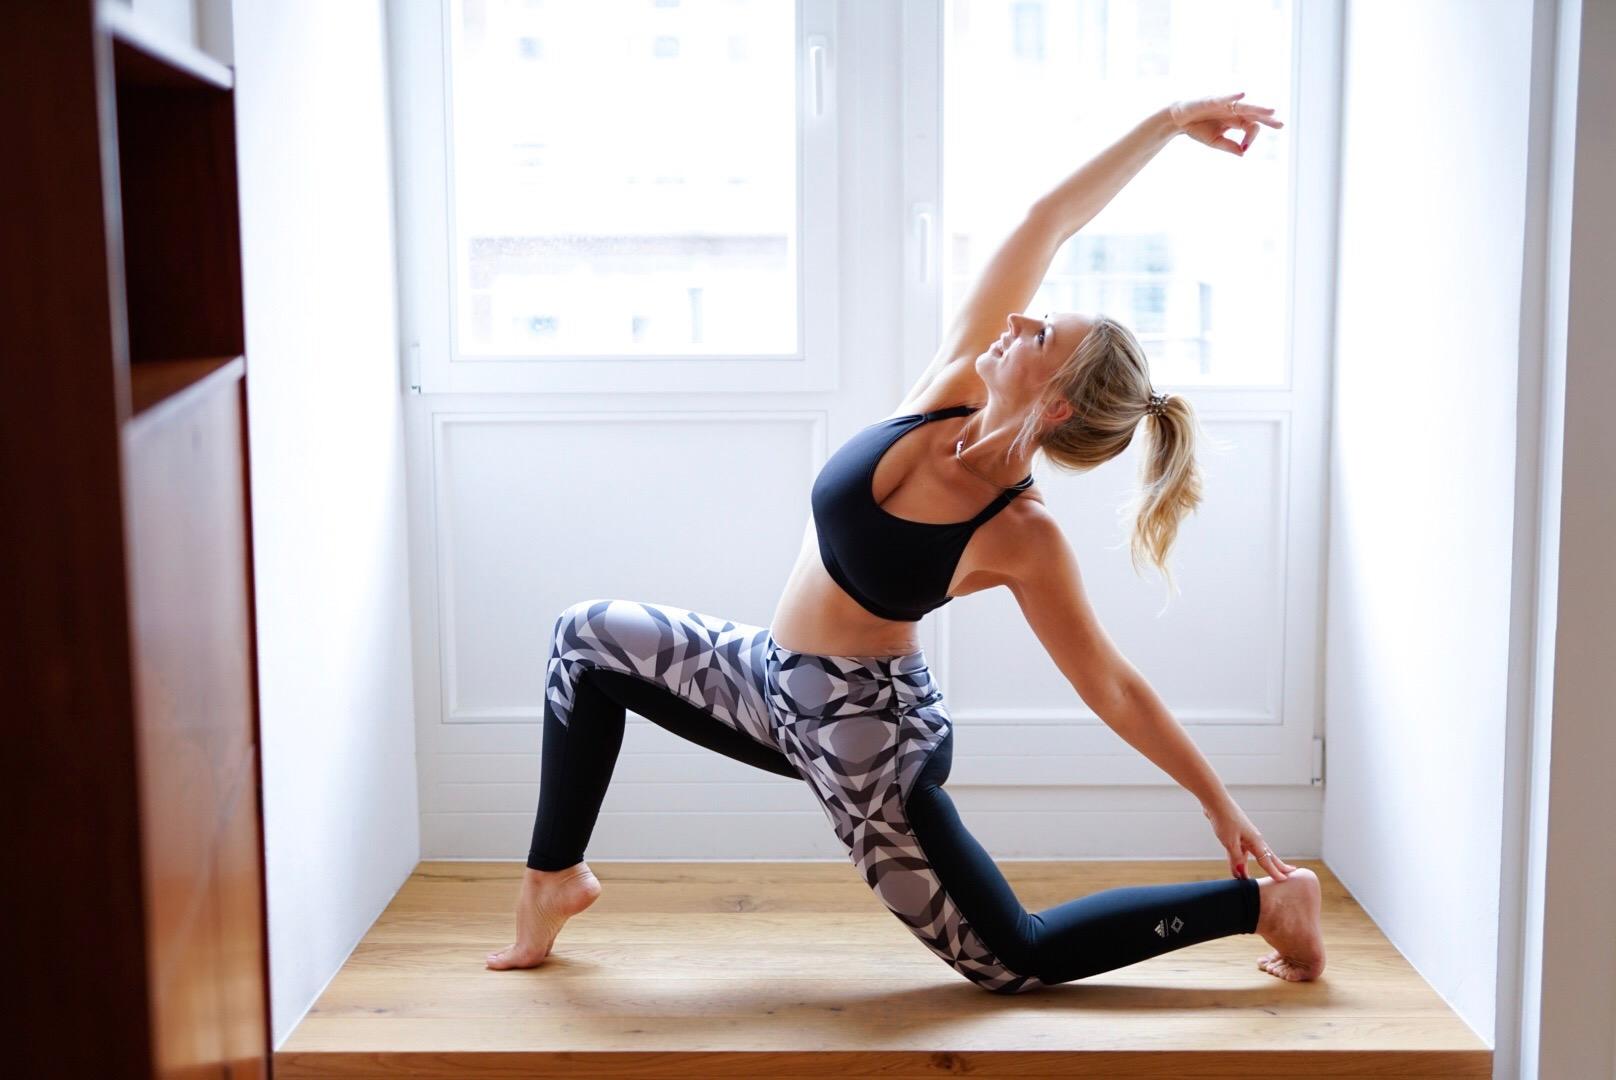 Yoga Teacher Wellness Entrepreneur Coaching